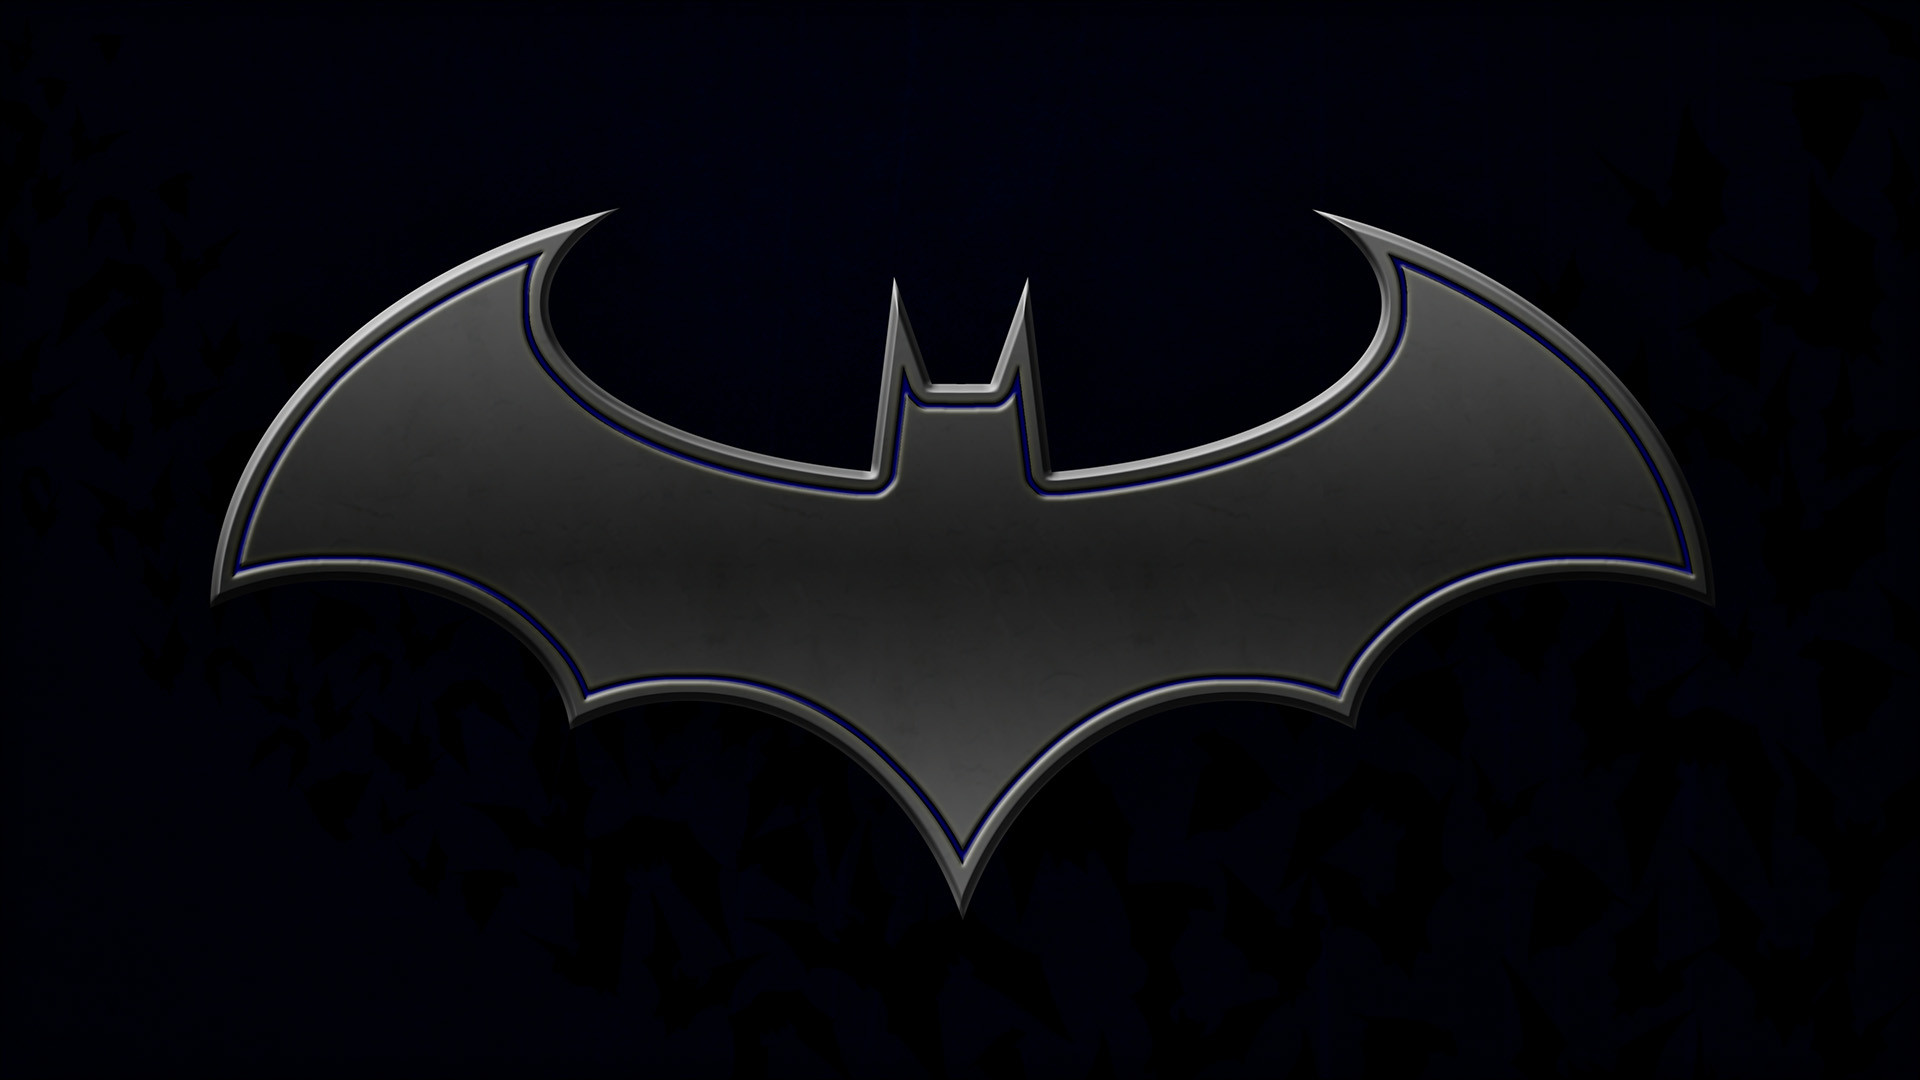 Batman Wallpaper Iphone Hd Batman wallpap…